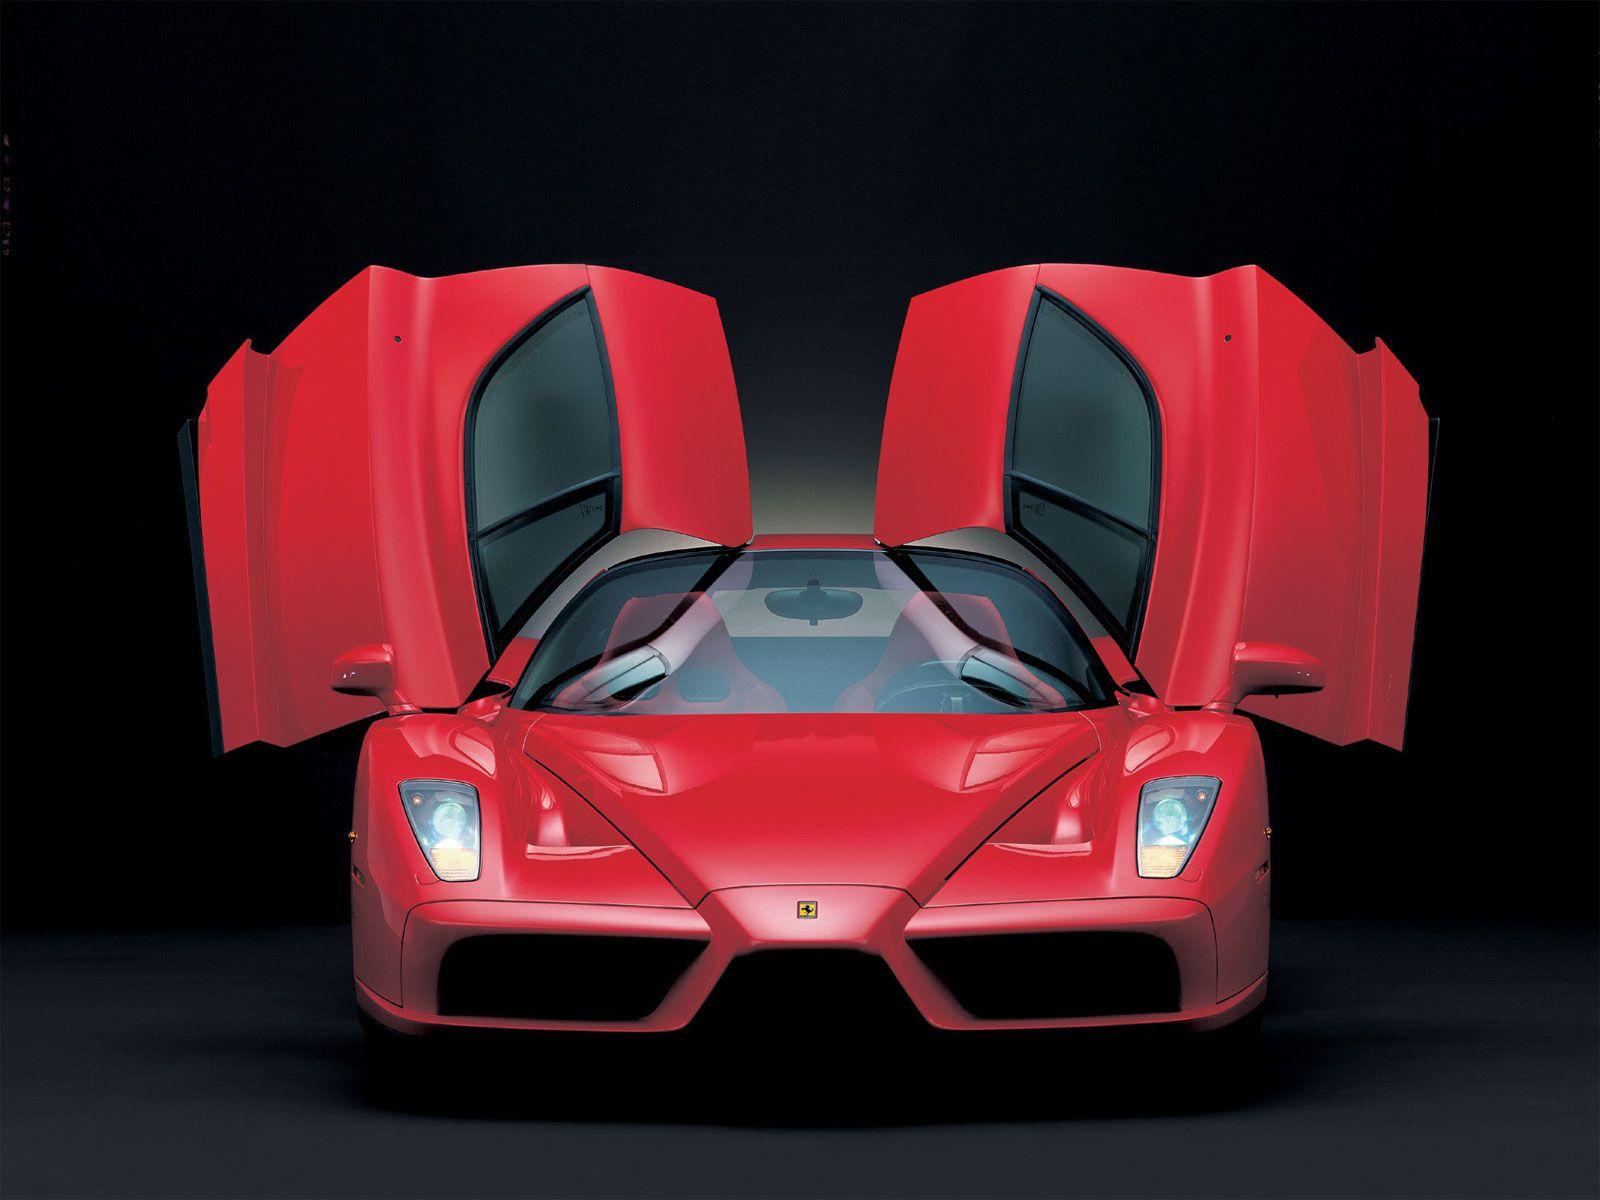 Hot Car Wallpaper 277 - http://dailywallpapers.com/hot-car-wallpaper-277/ - #Wallpapers #CoverPhotos #Cars